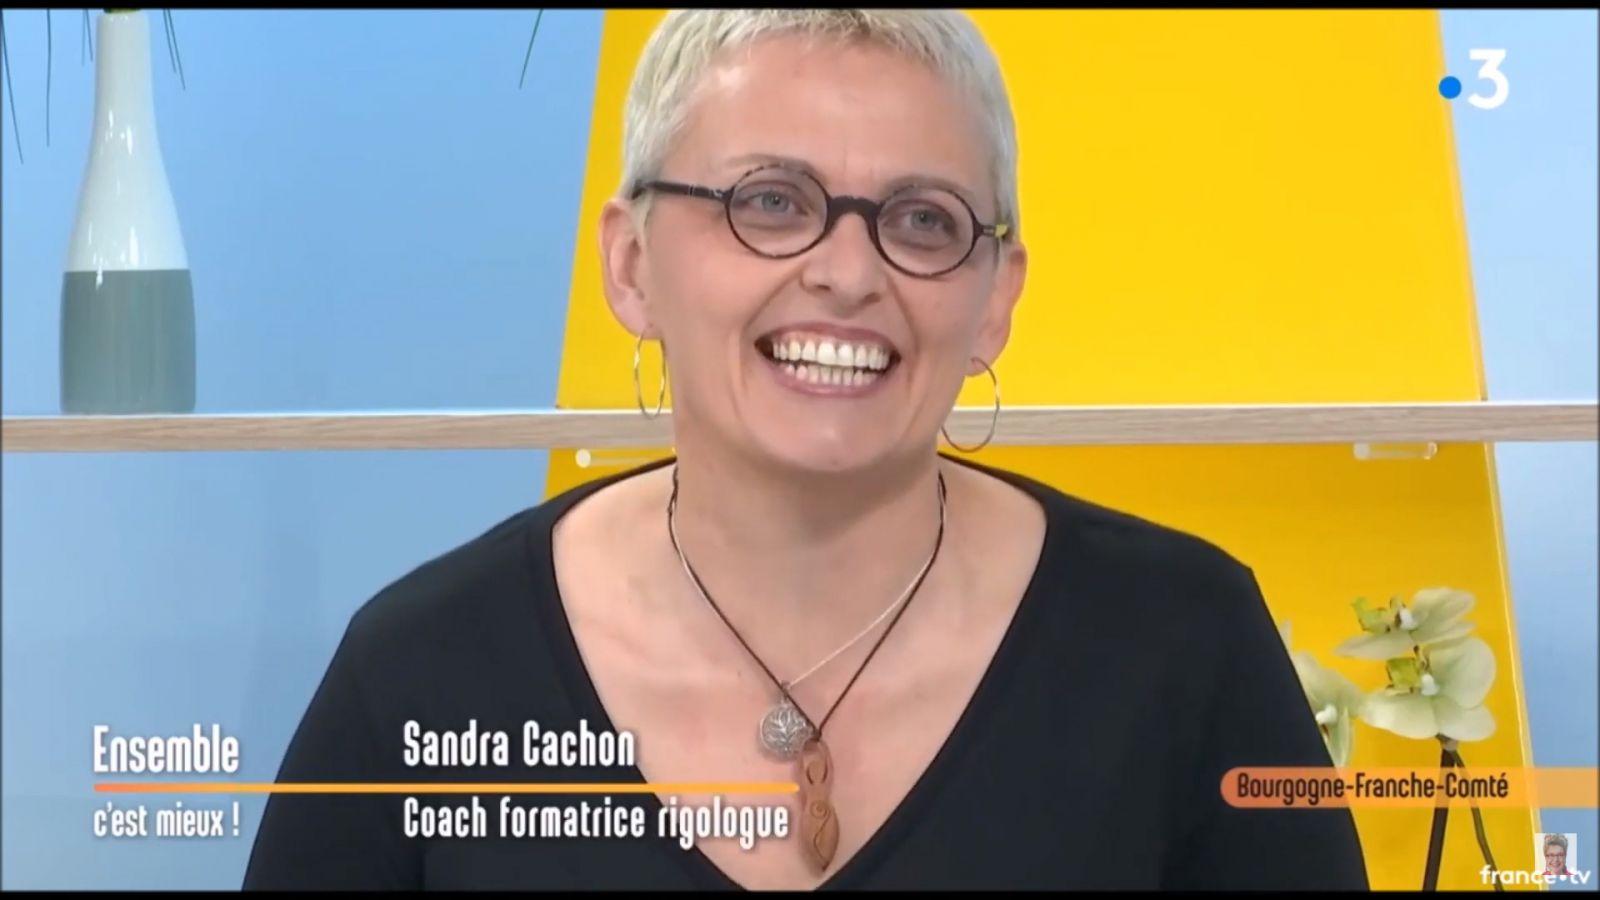 Sandra Cachon, Rigologue Experte, présente la rigologie